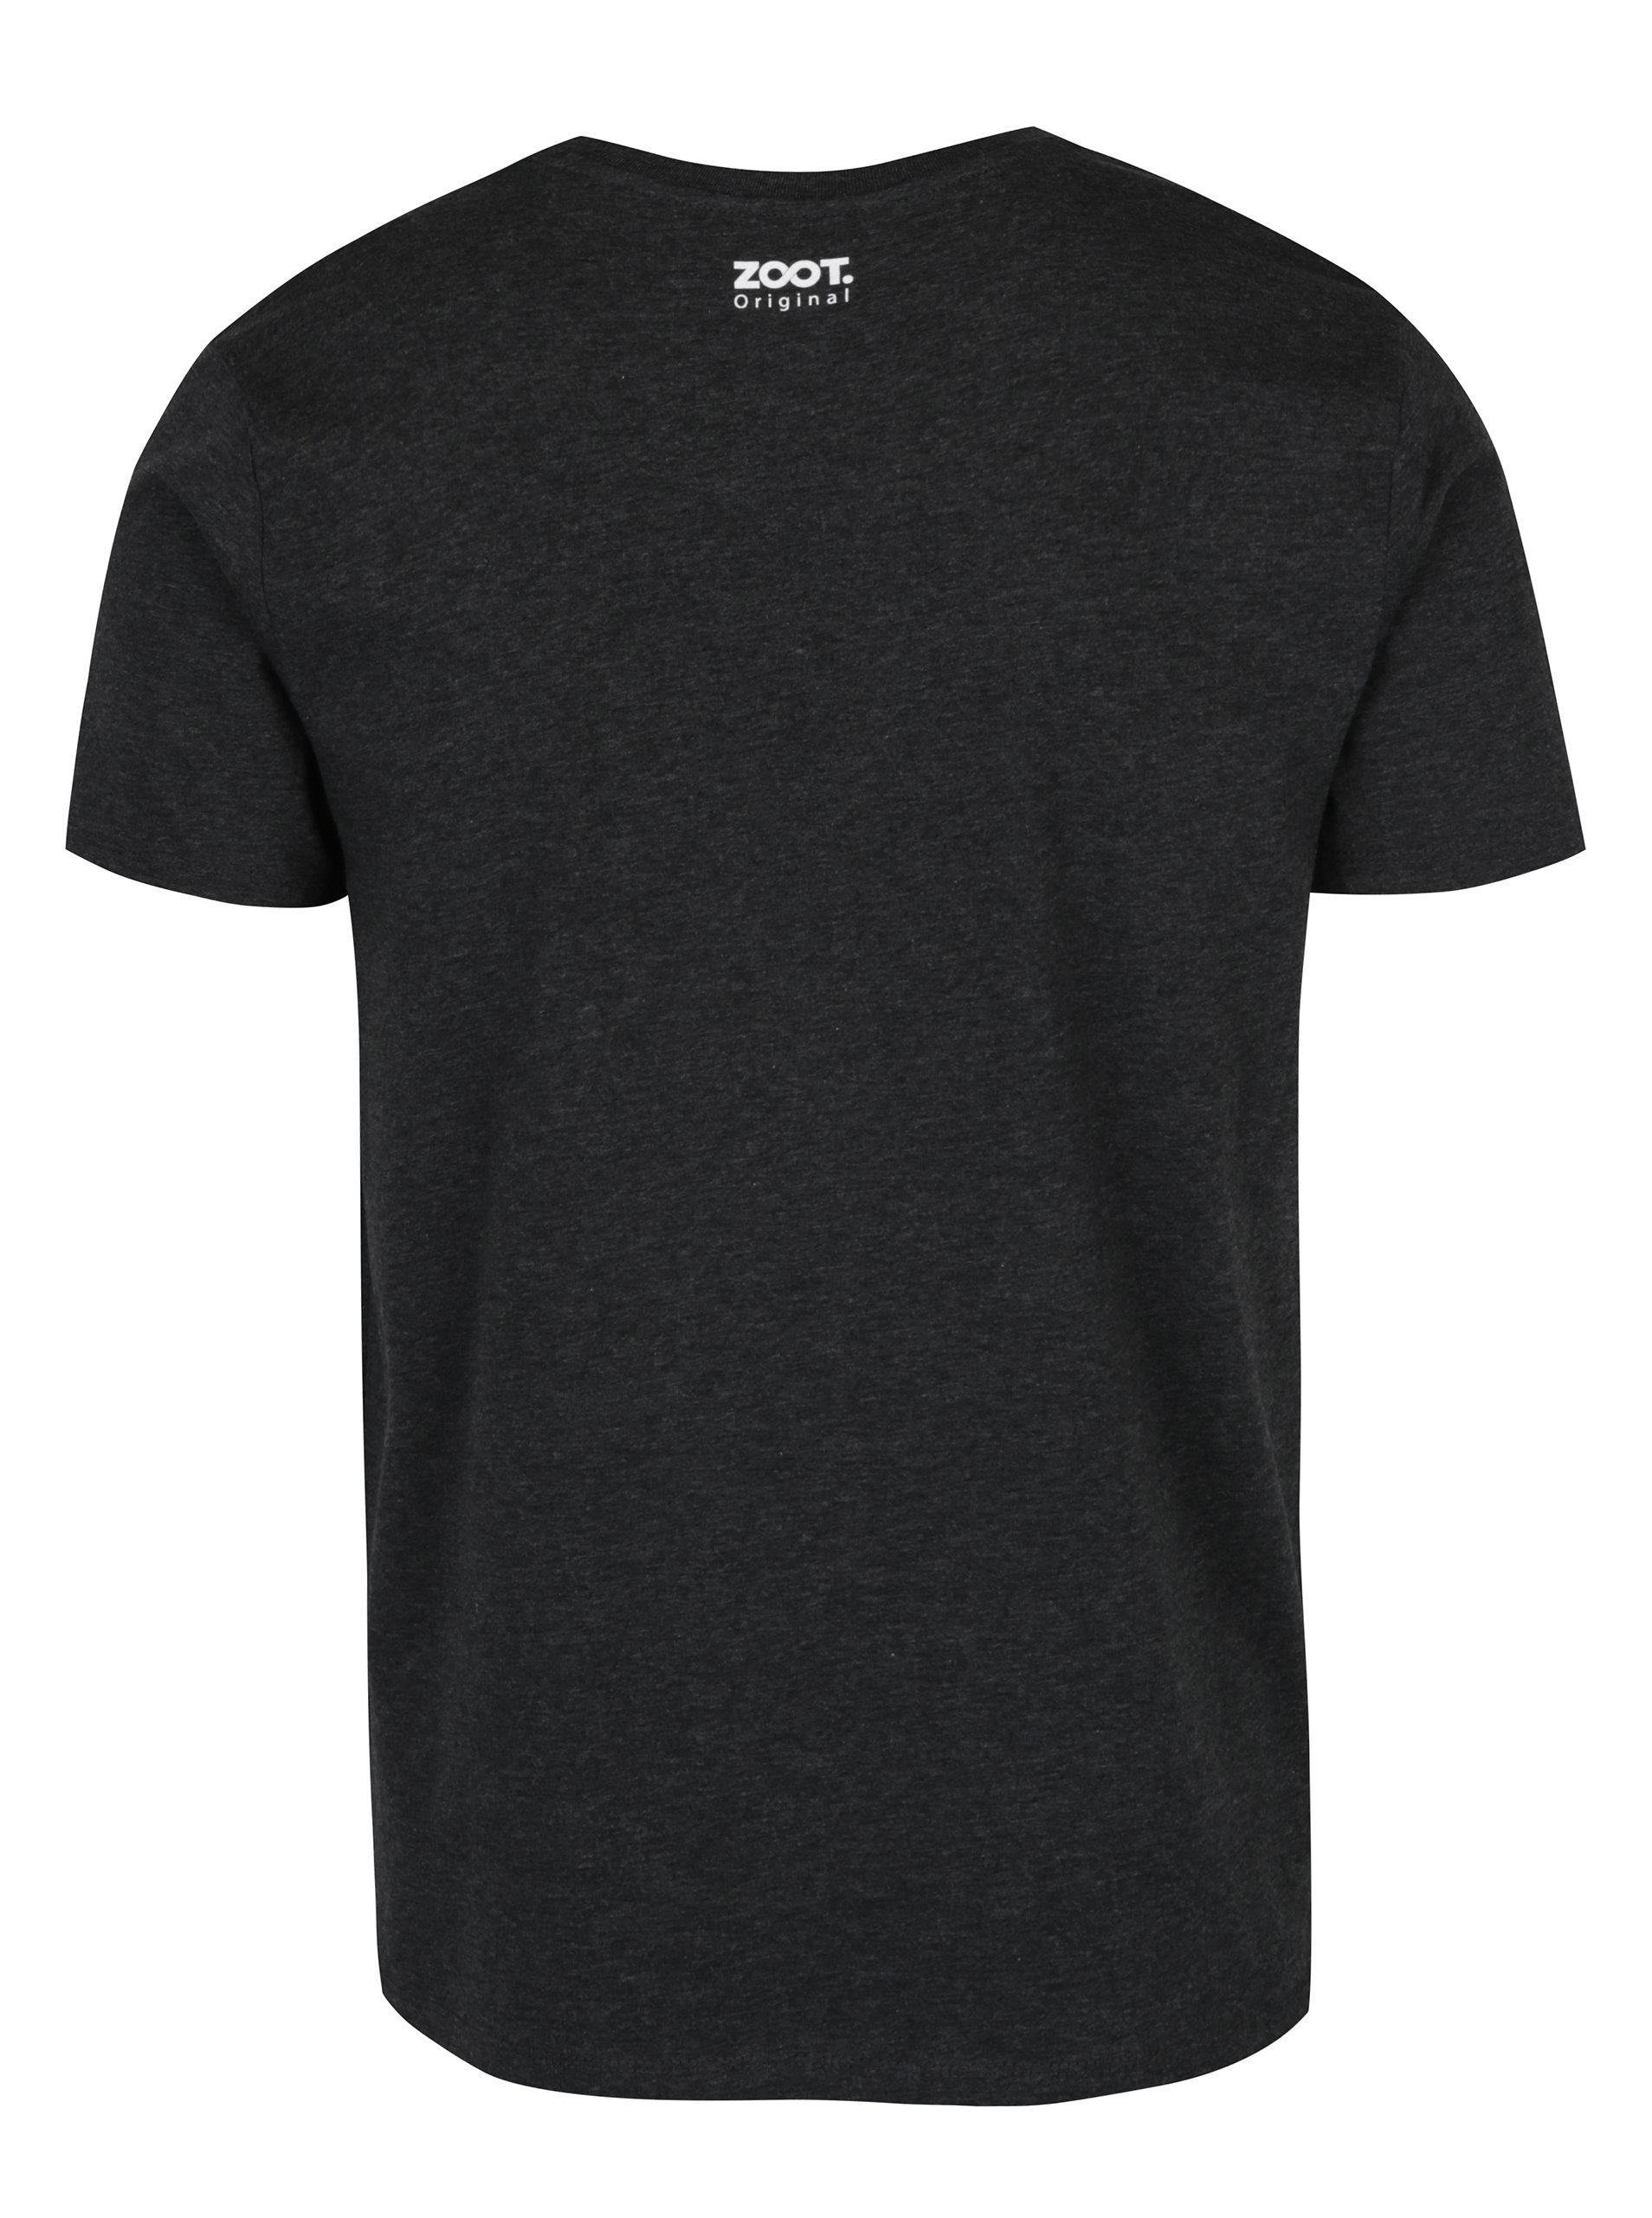 Tmavě šedé pánské tričko ZOOT Originál Genius ... 8467b2a7c8